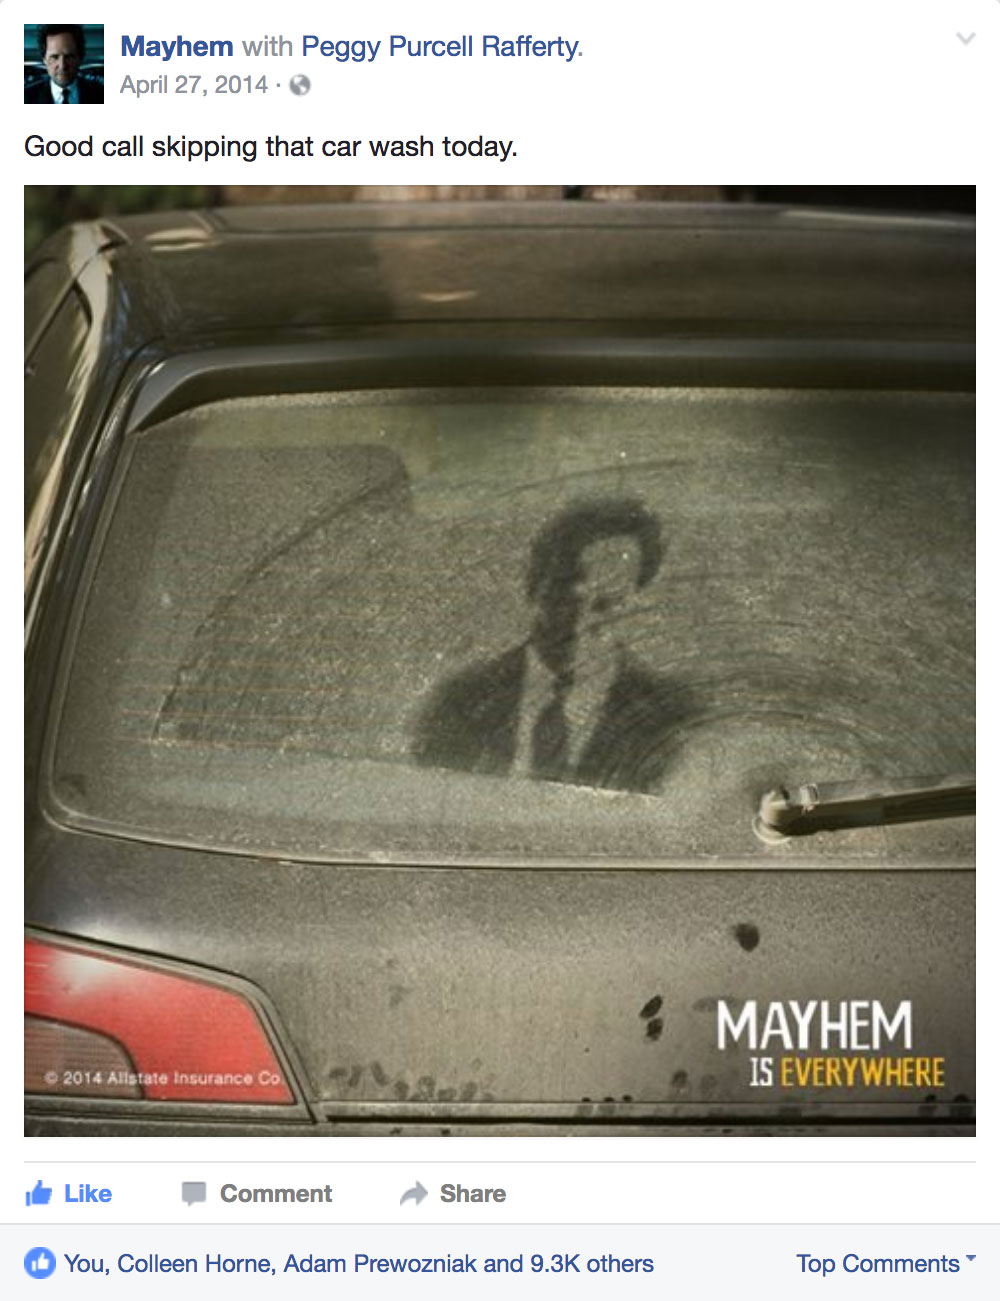 3_Spring_Is_Mayhem.jpg